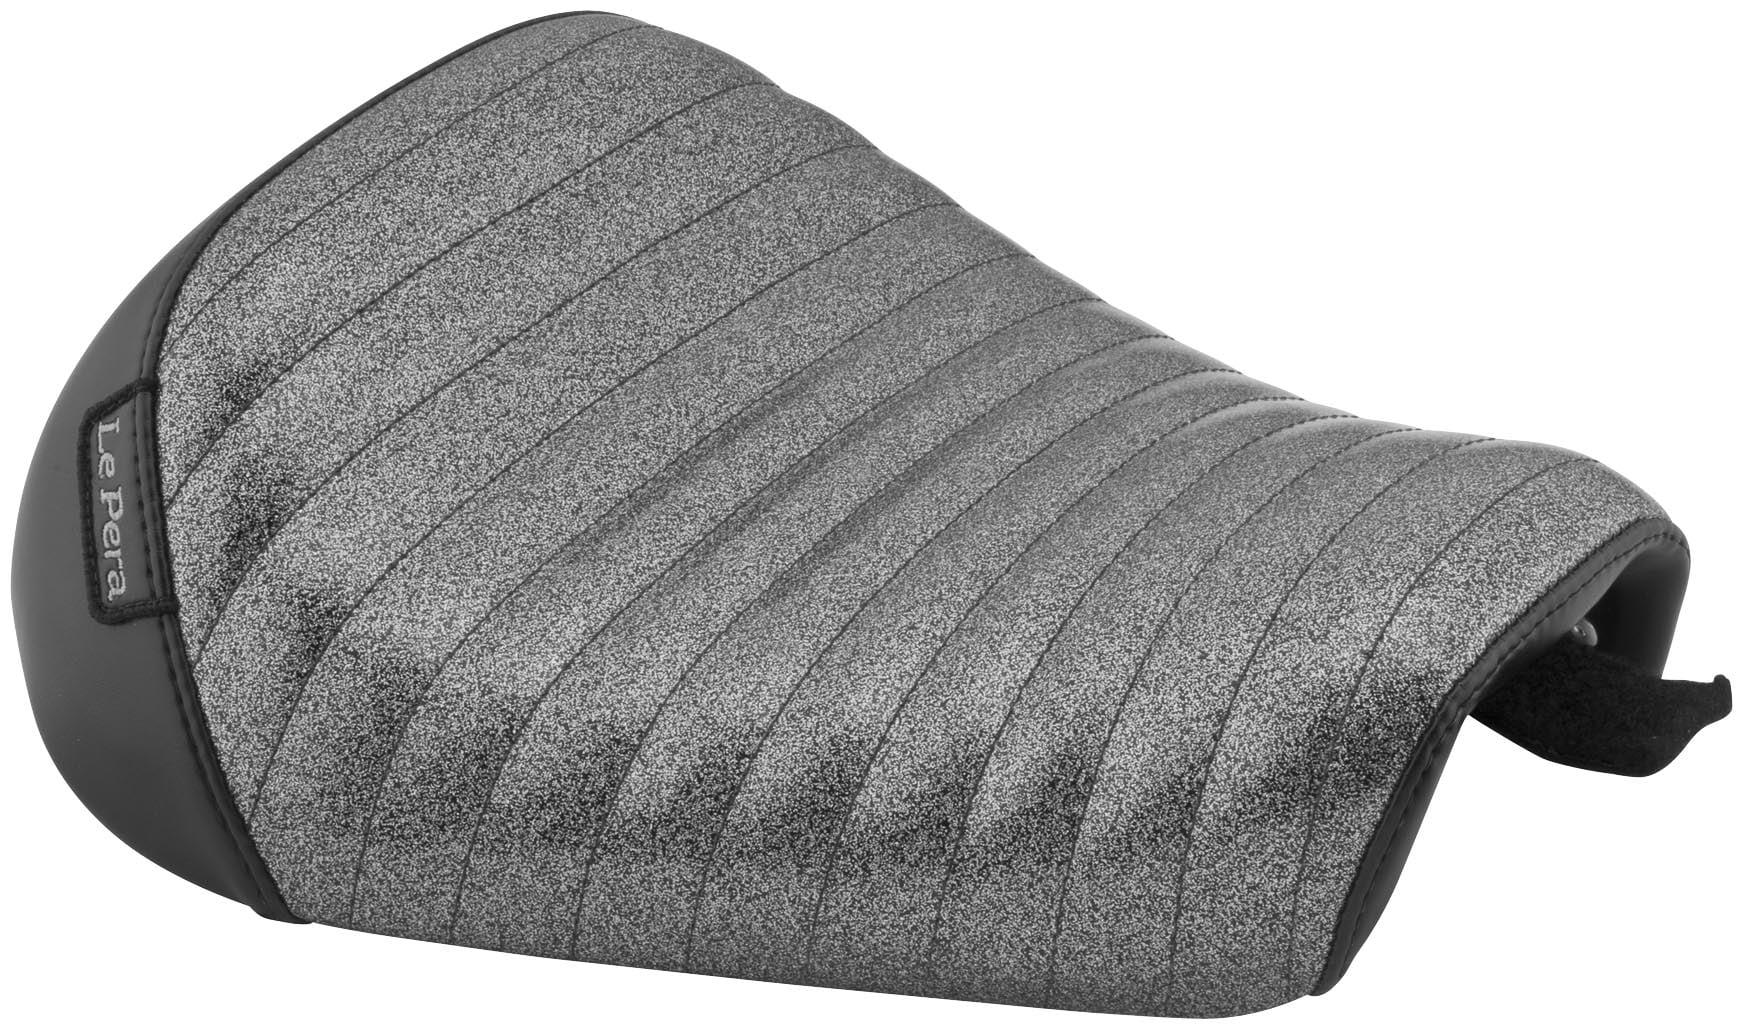 Le Pera Lk 006cmpt Bare Bones Solo Seat Pleated Charcoal Metal